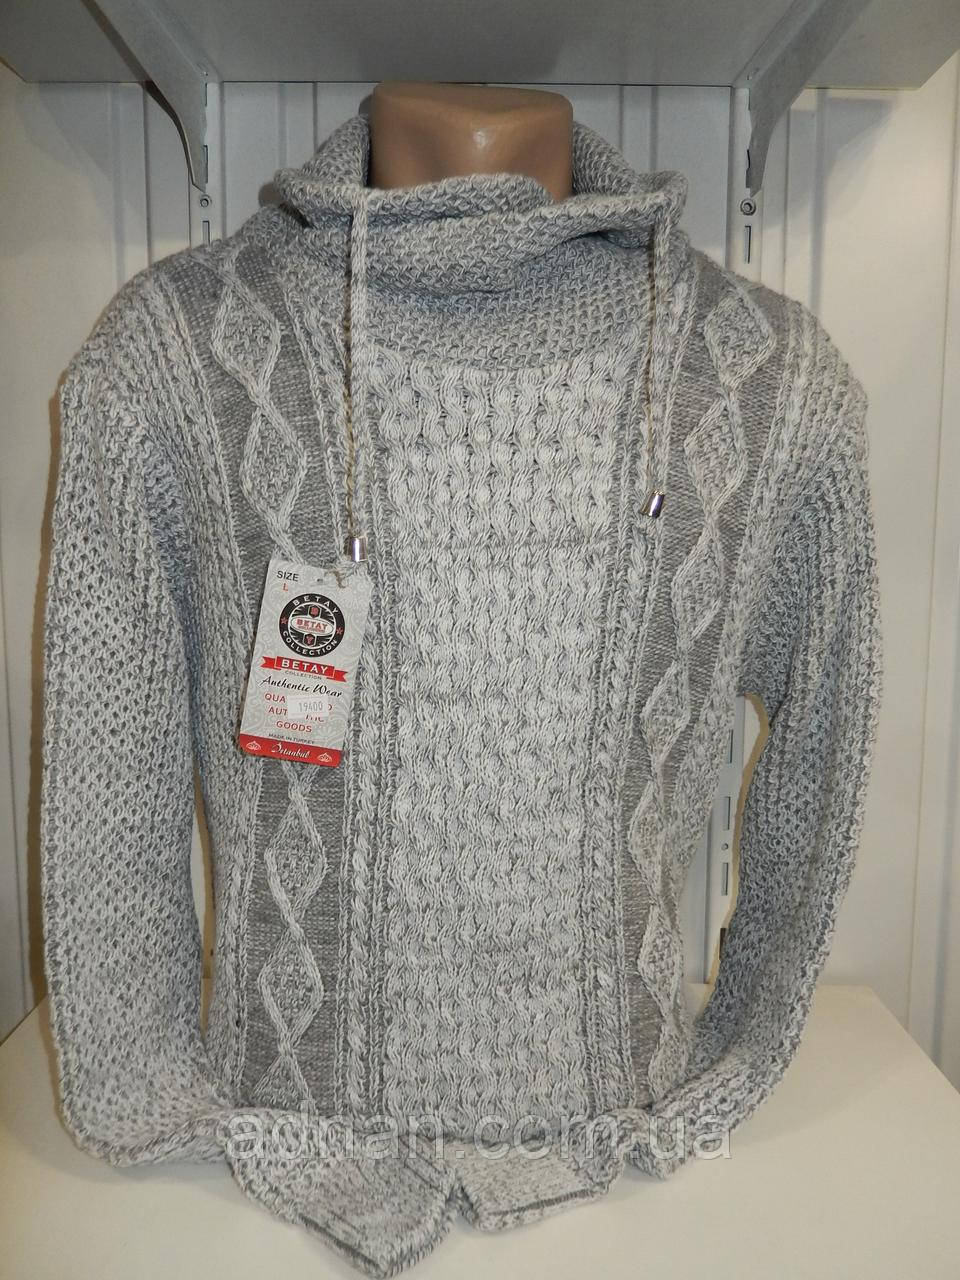 Свитер зимний, шаль BEKTAS модель №19400 002/ купить оптом свитер зимний